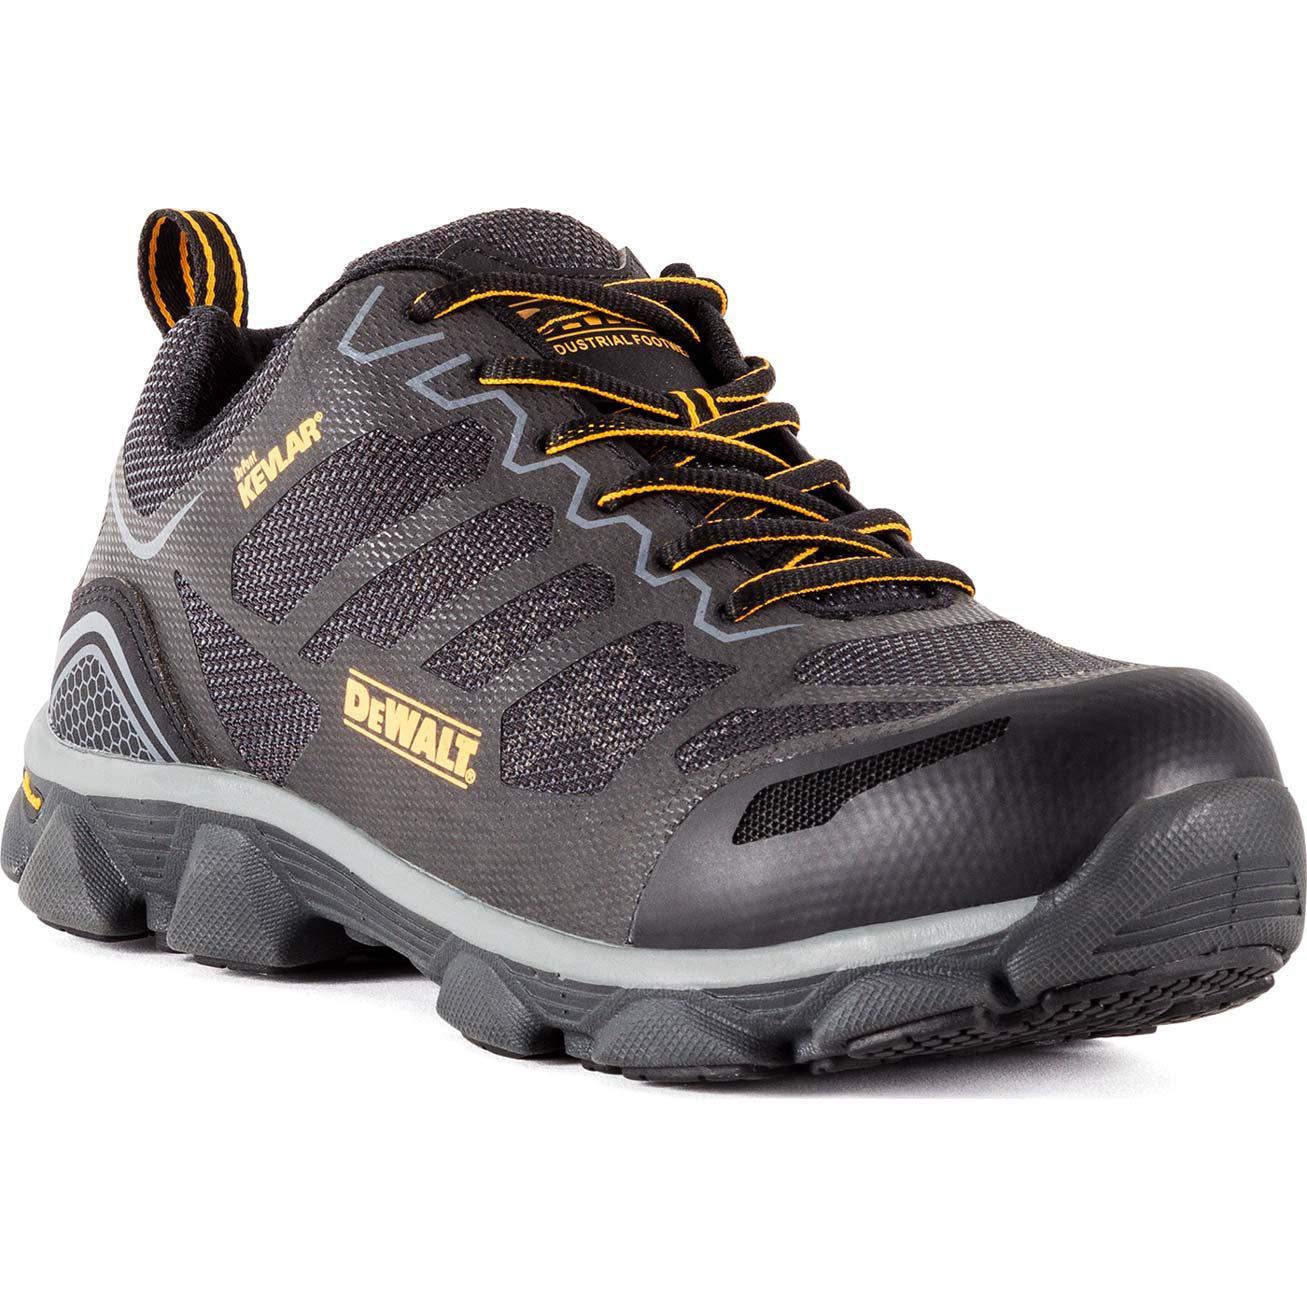 9296a3076ed DEWALT® Crossfire Low Kevlar Aluminum Toe Work Athletic Shoe